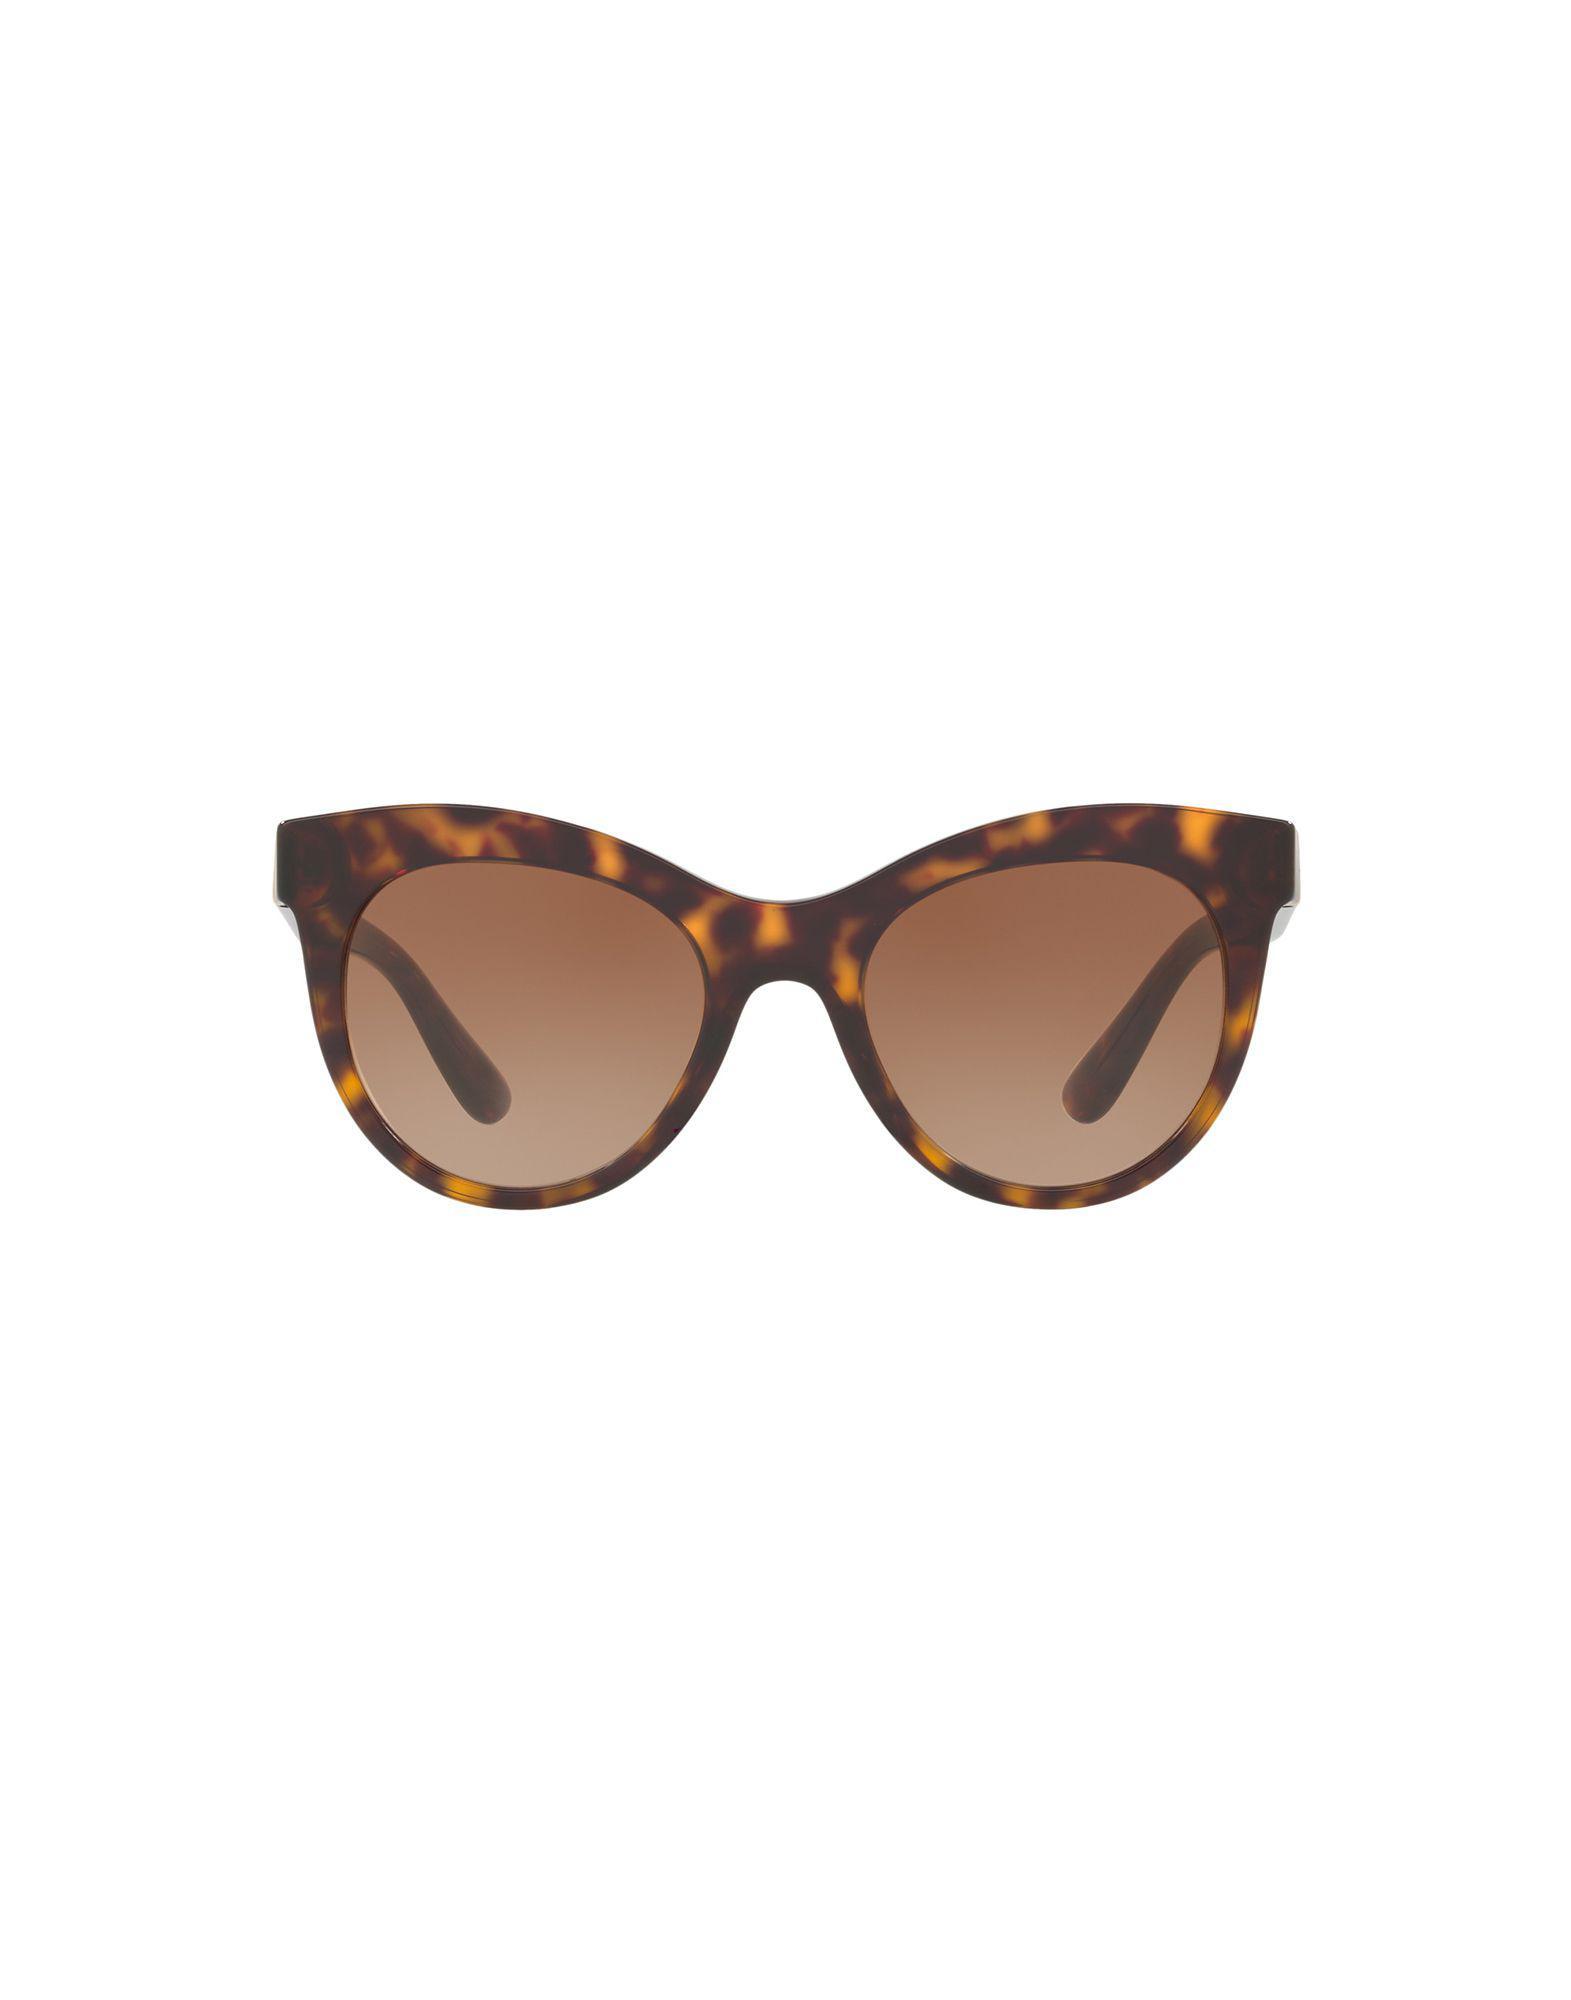 762ae386dd8 Dolce   Gabbana Sunglasses in Brown - Lyst